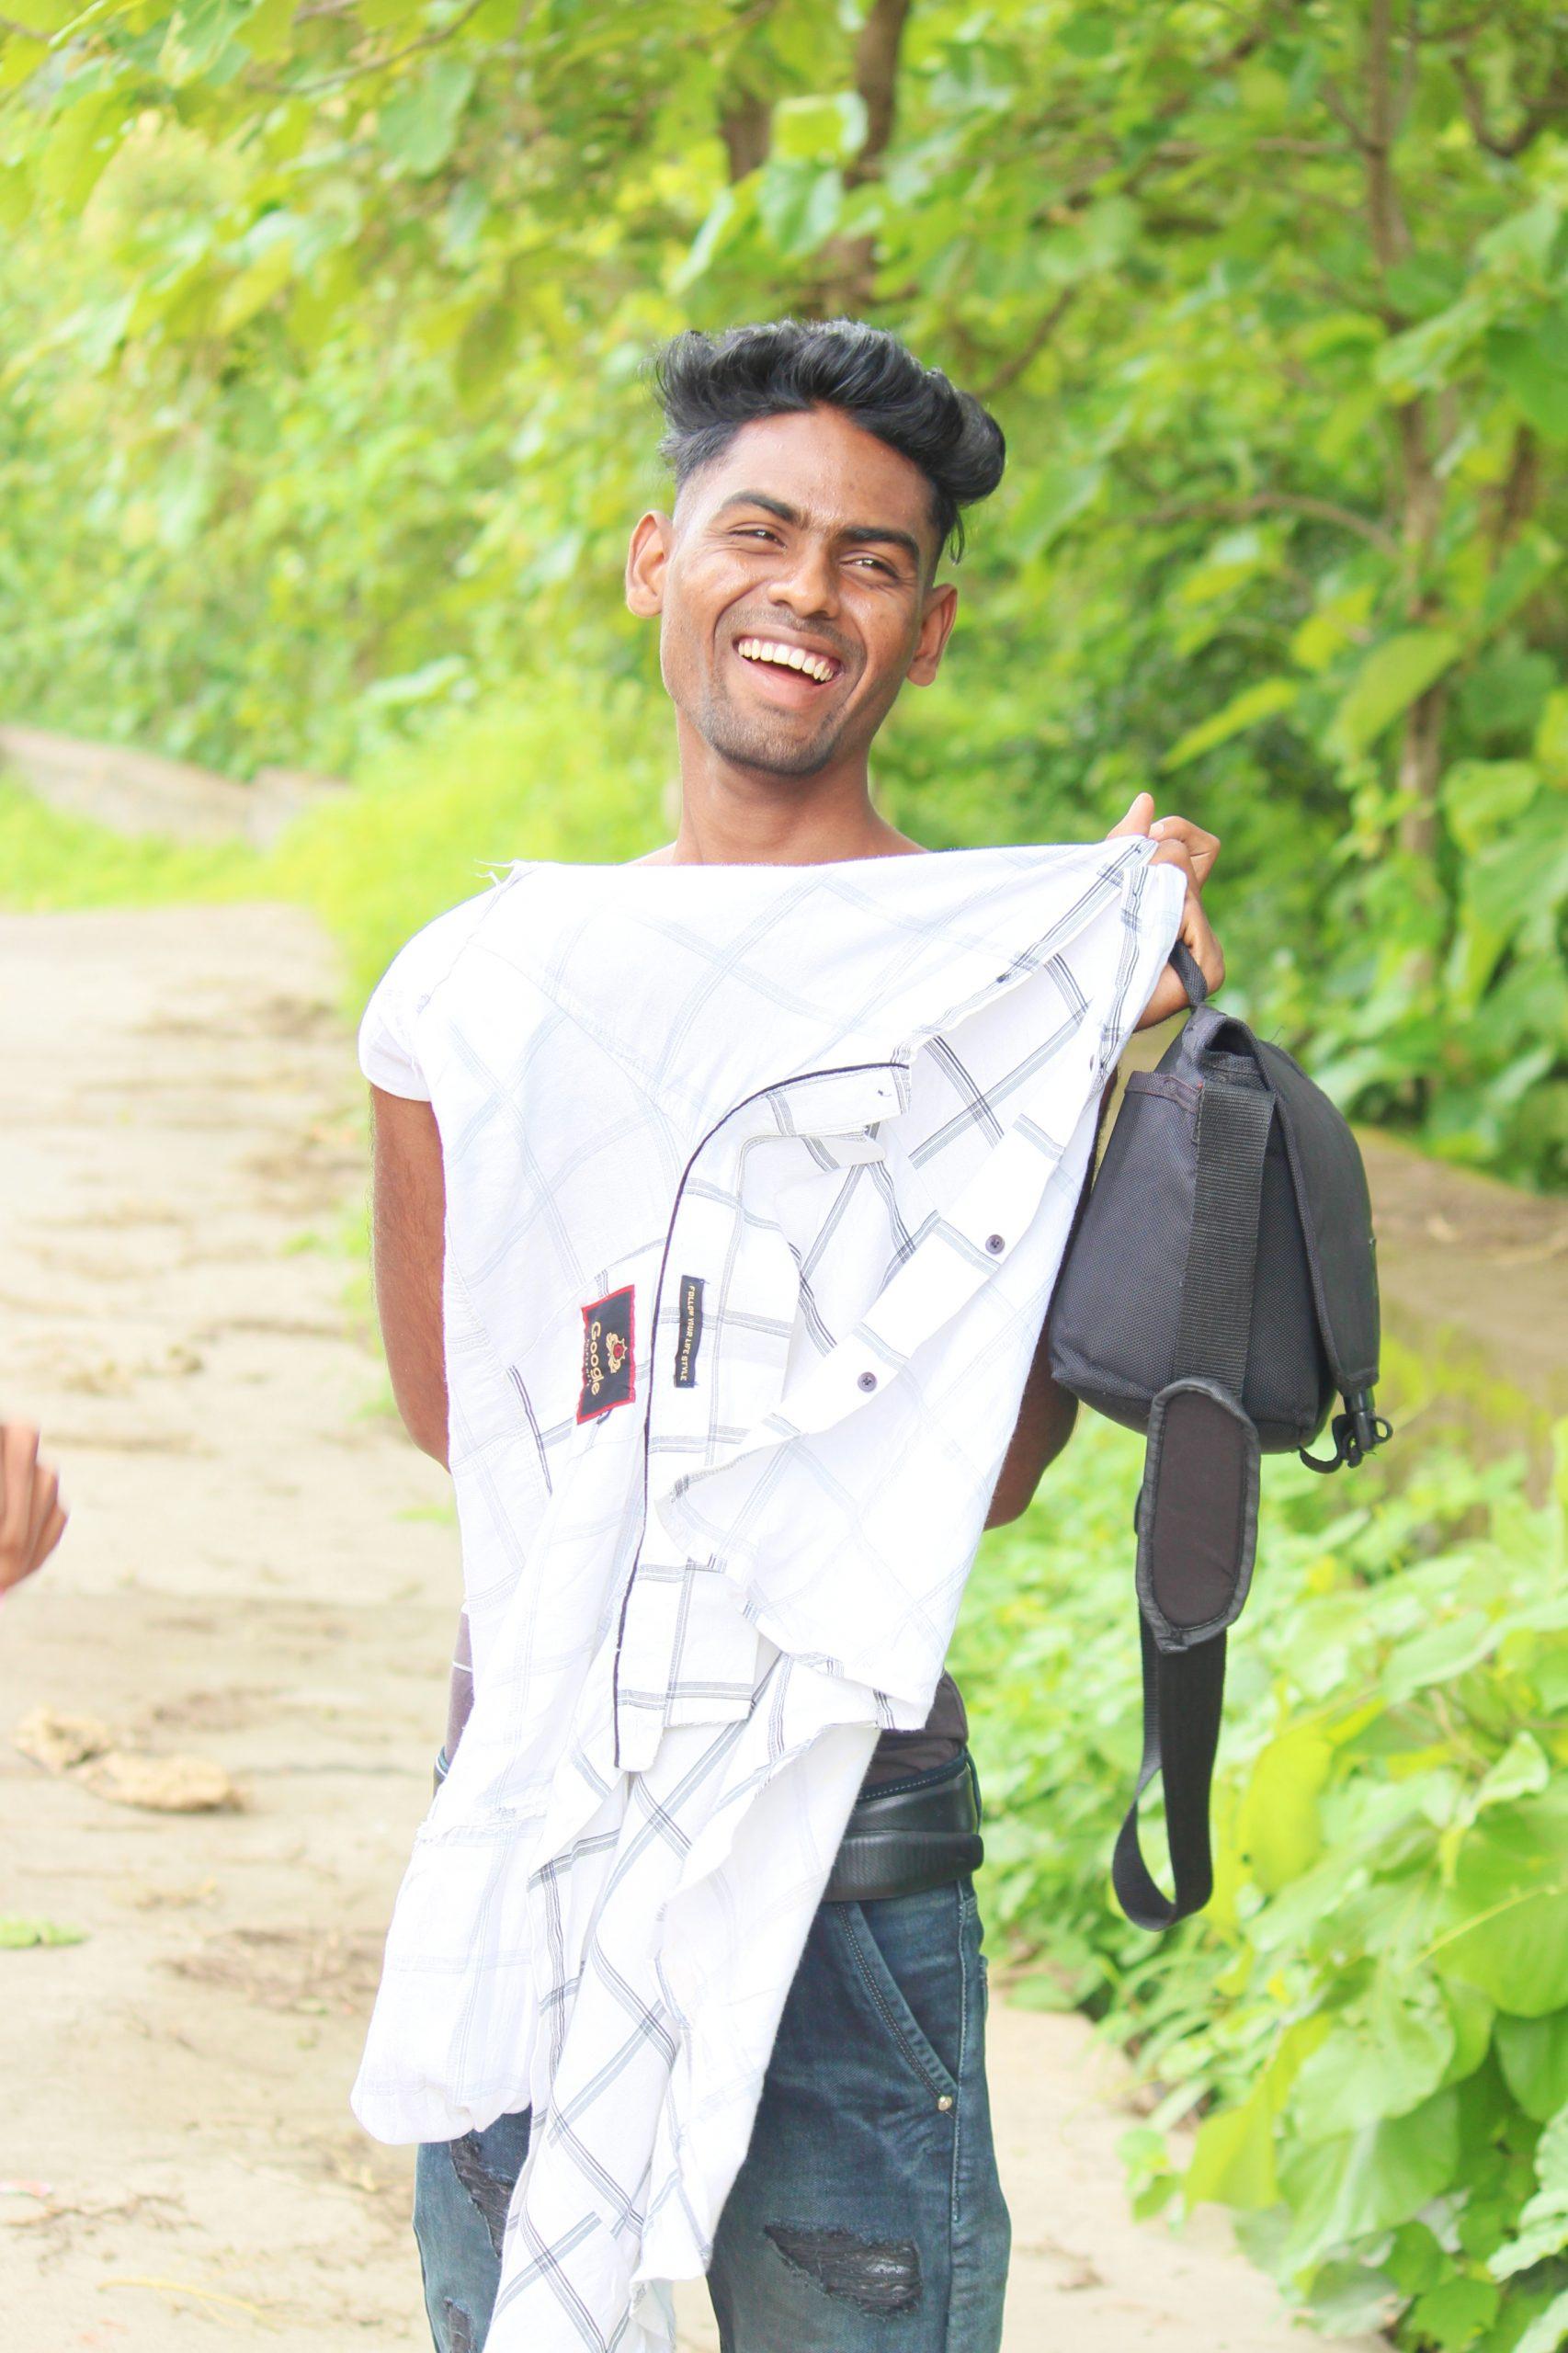 Boy posing and smiling